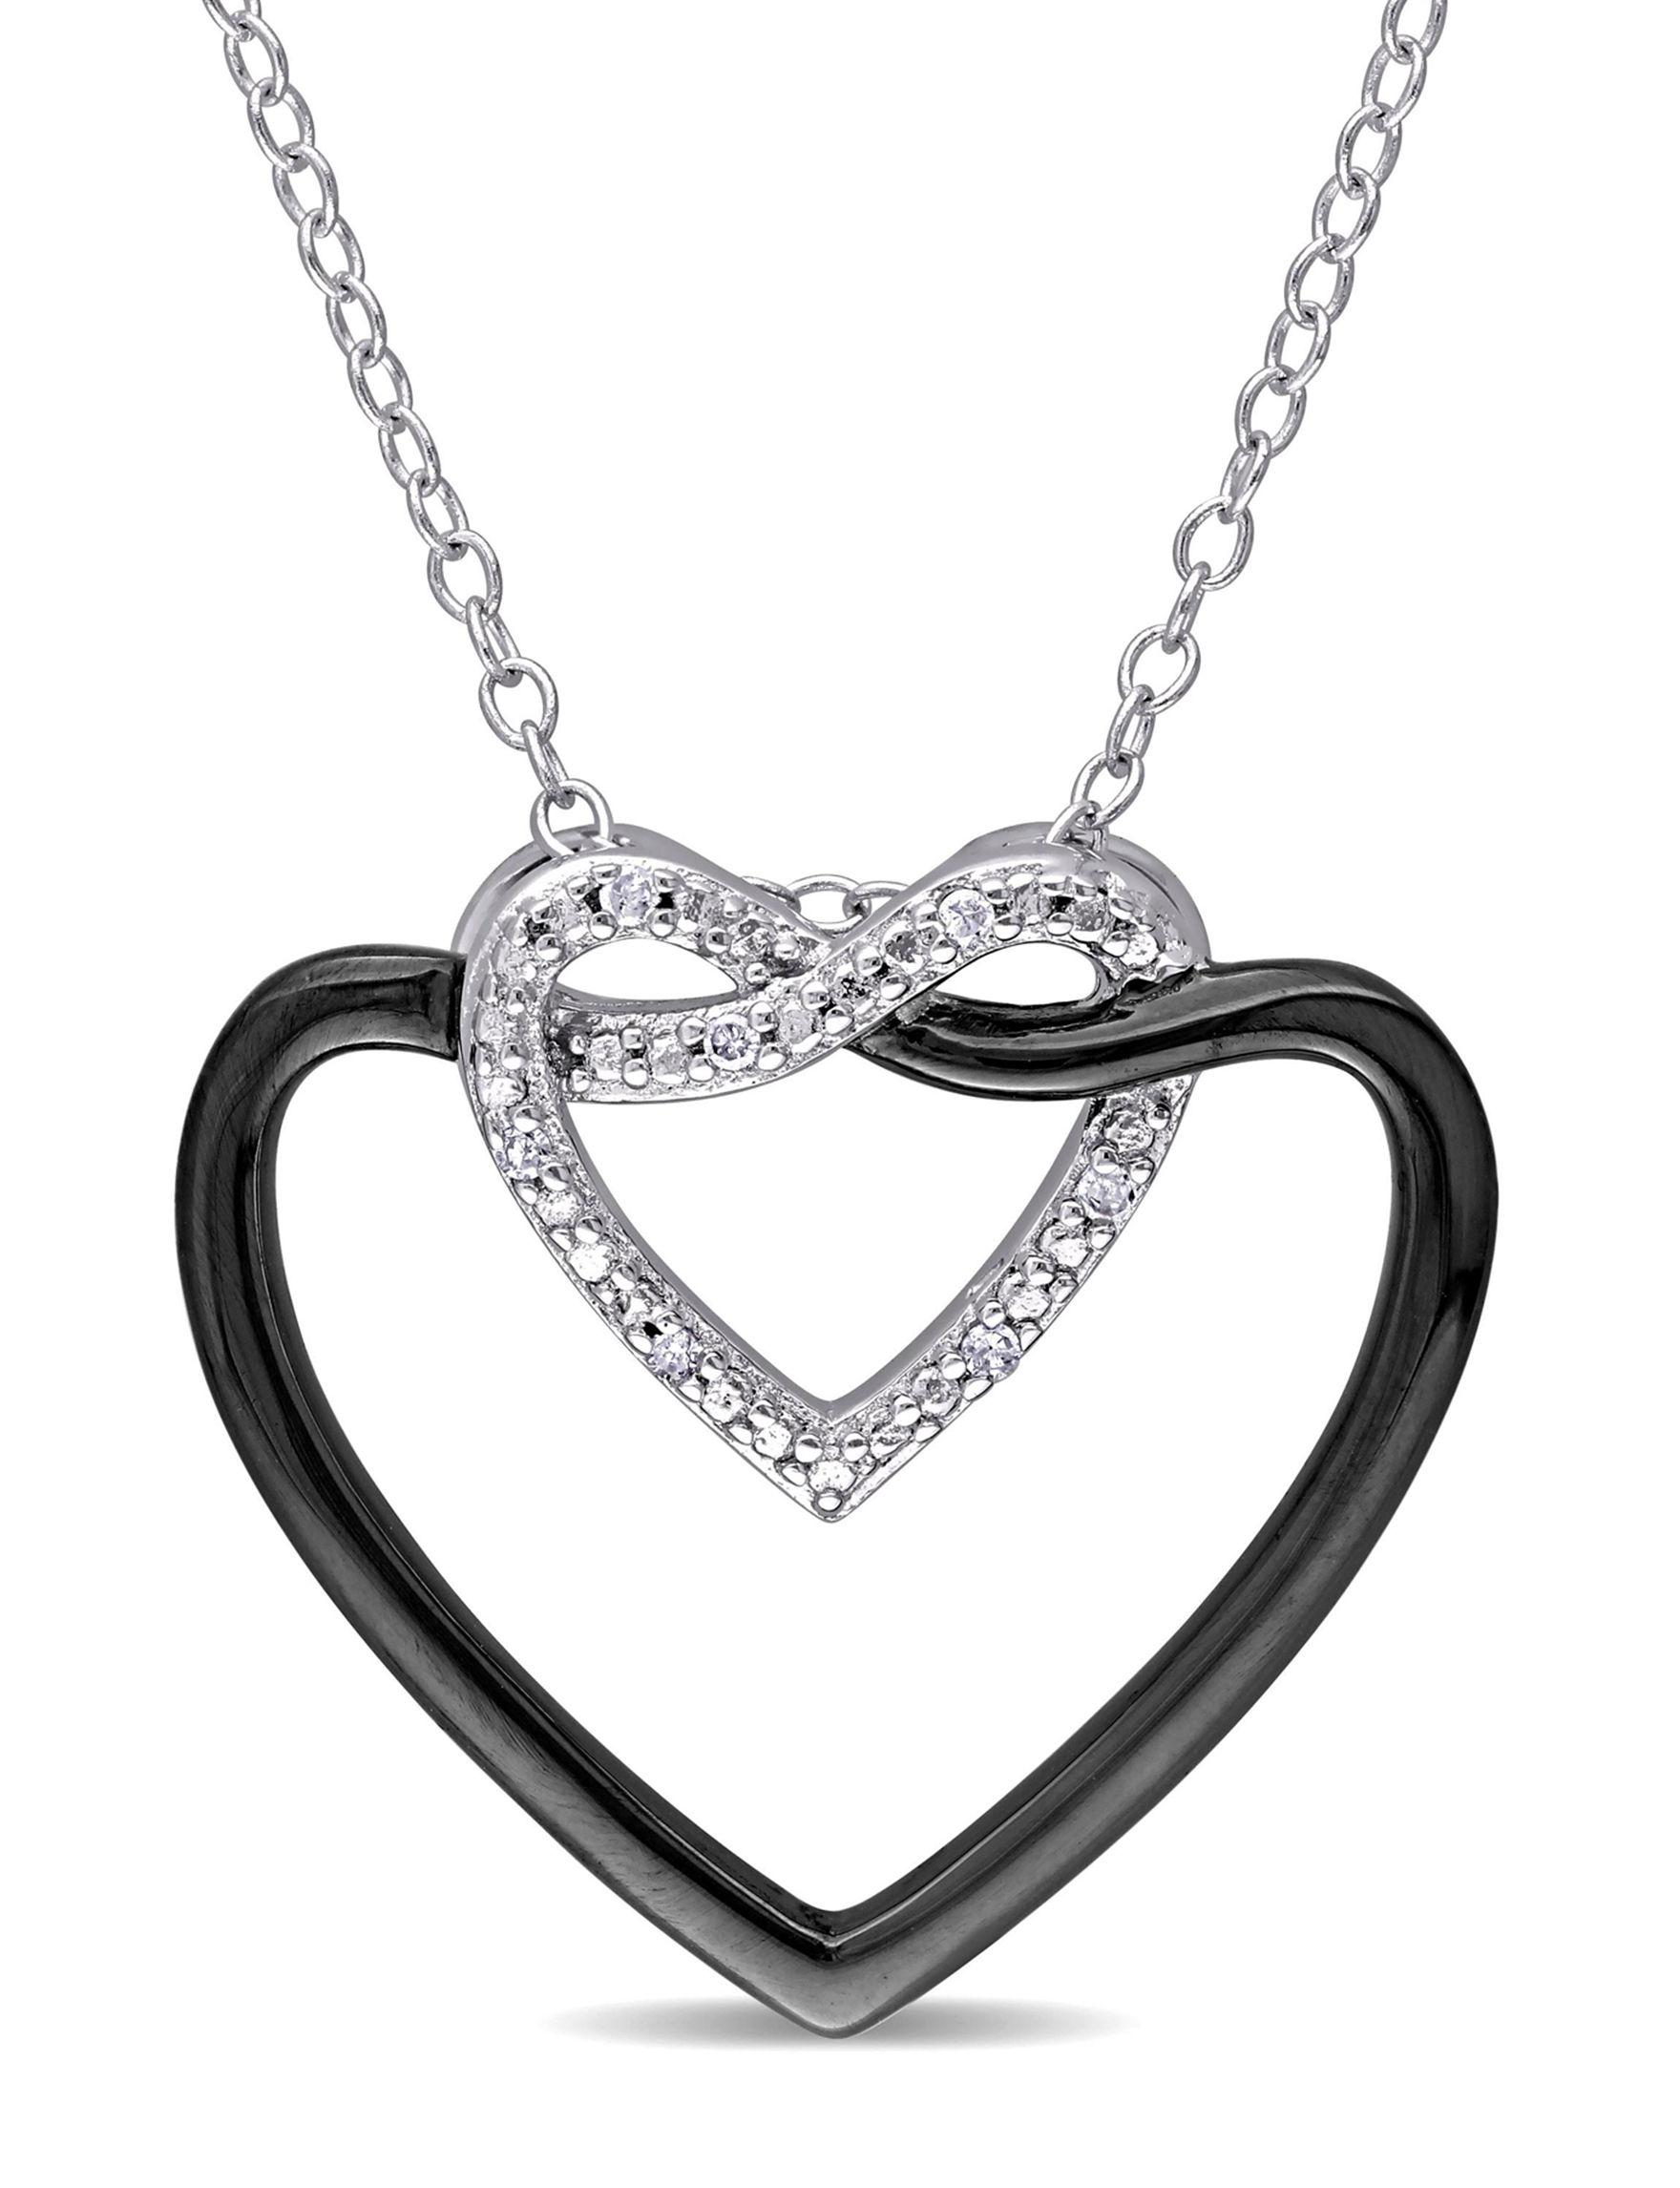 Concerto Diamonds Silver Necklaces & Pendants Fine Jewelry